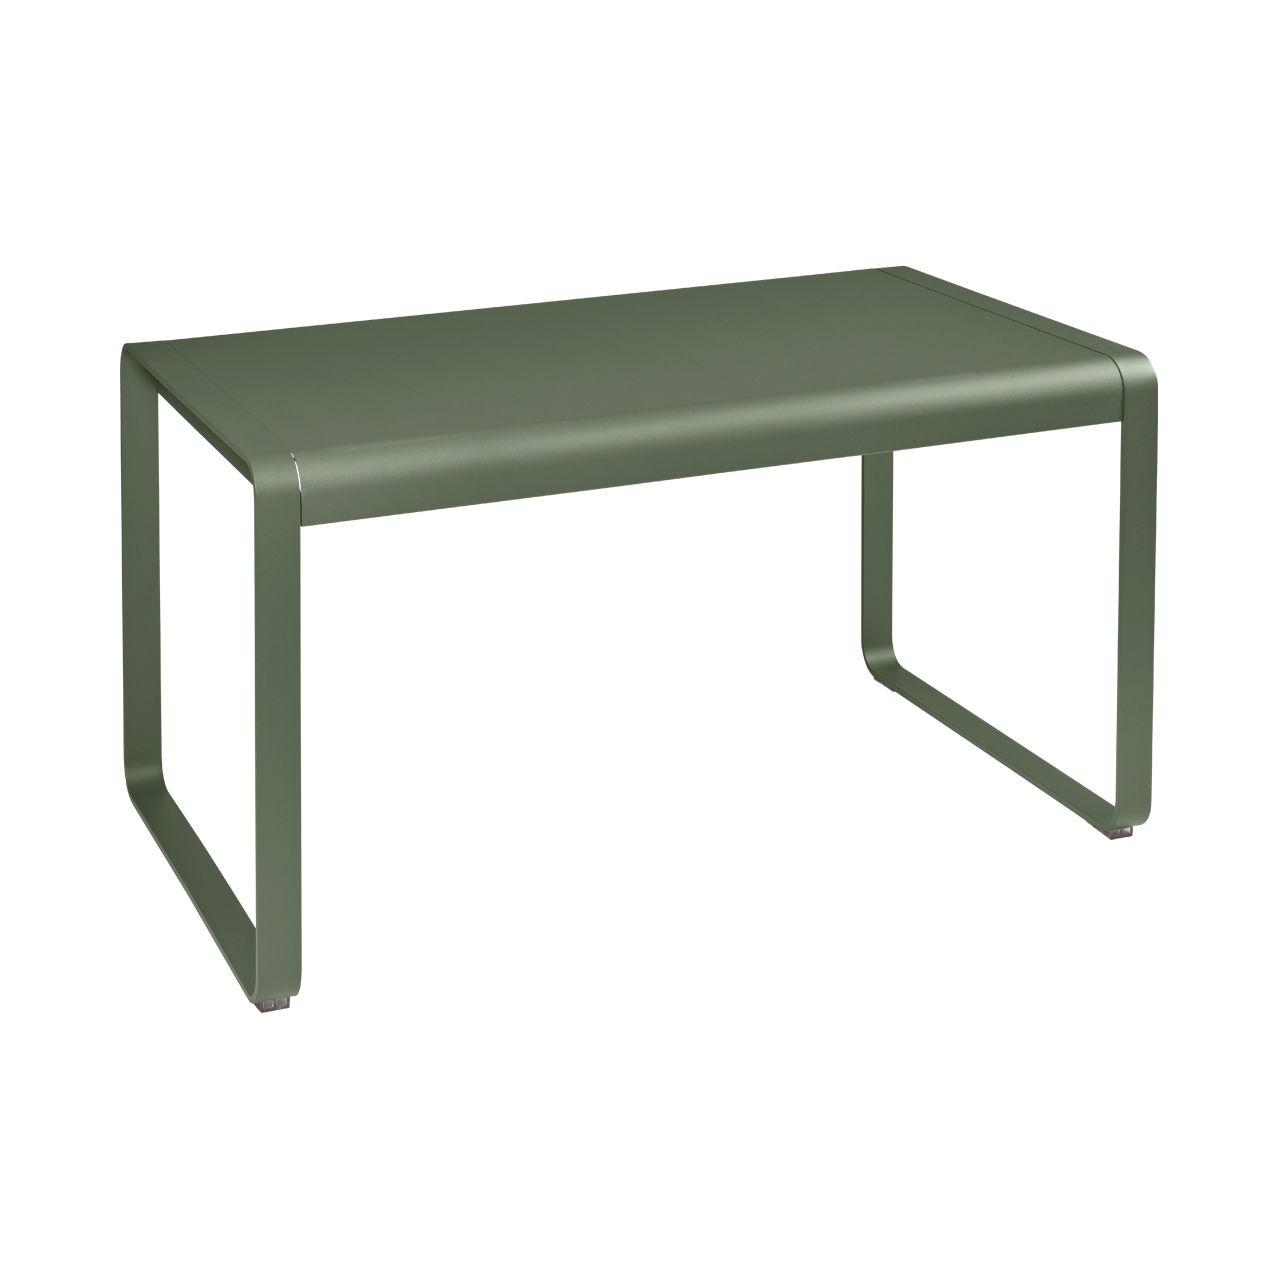 Table rectangulaire Bellevie / 140 x 80 cm - Métal - Fermob vert en métal